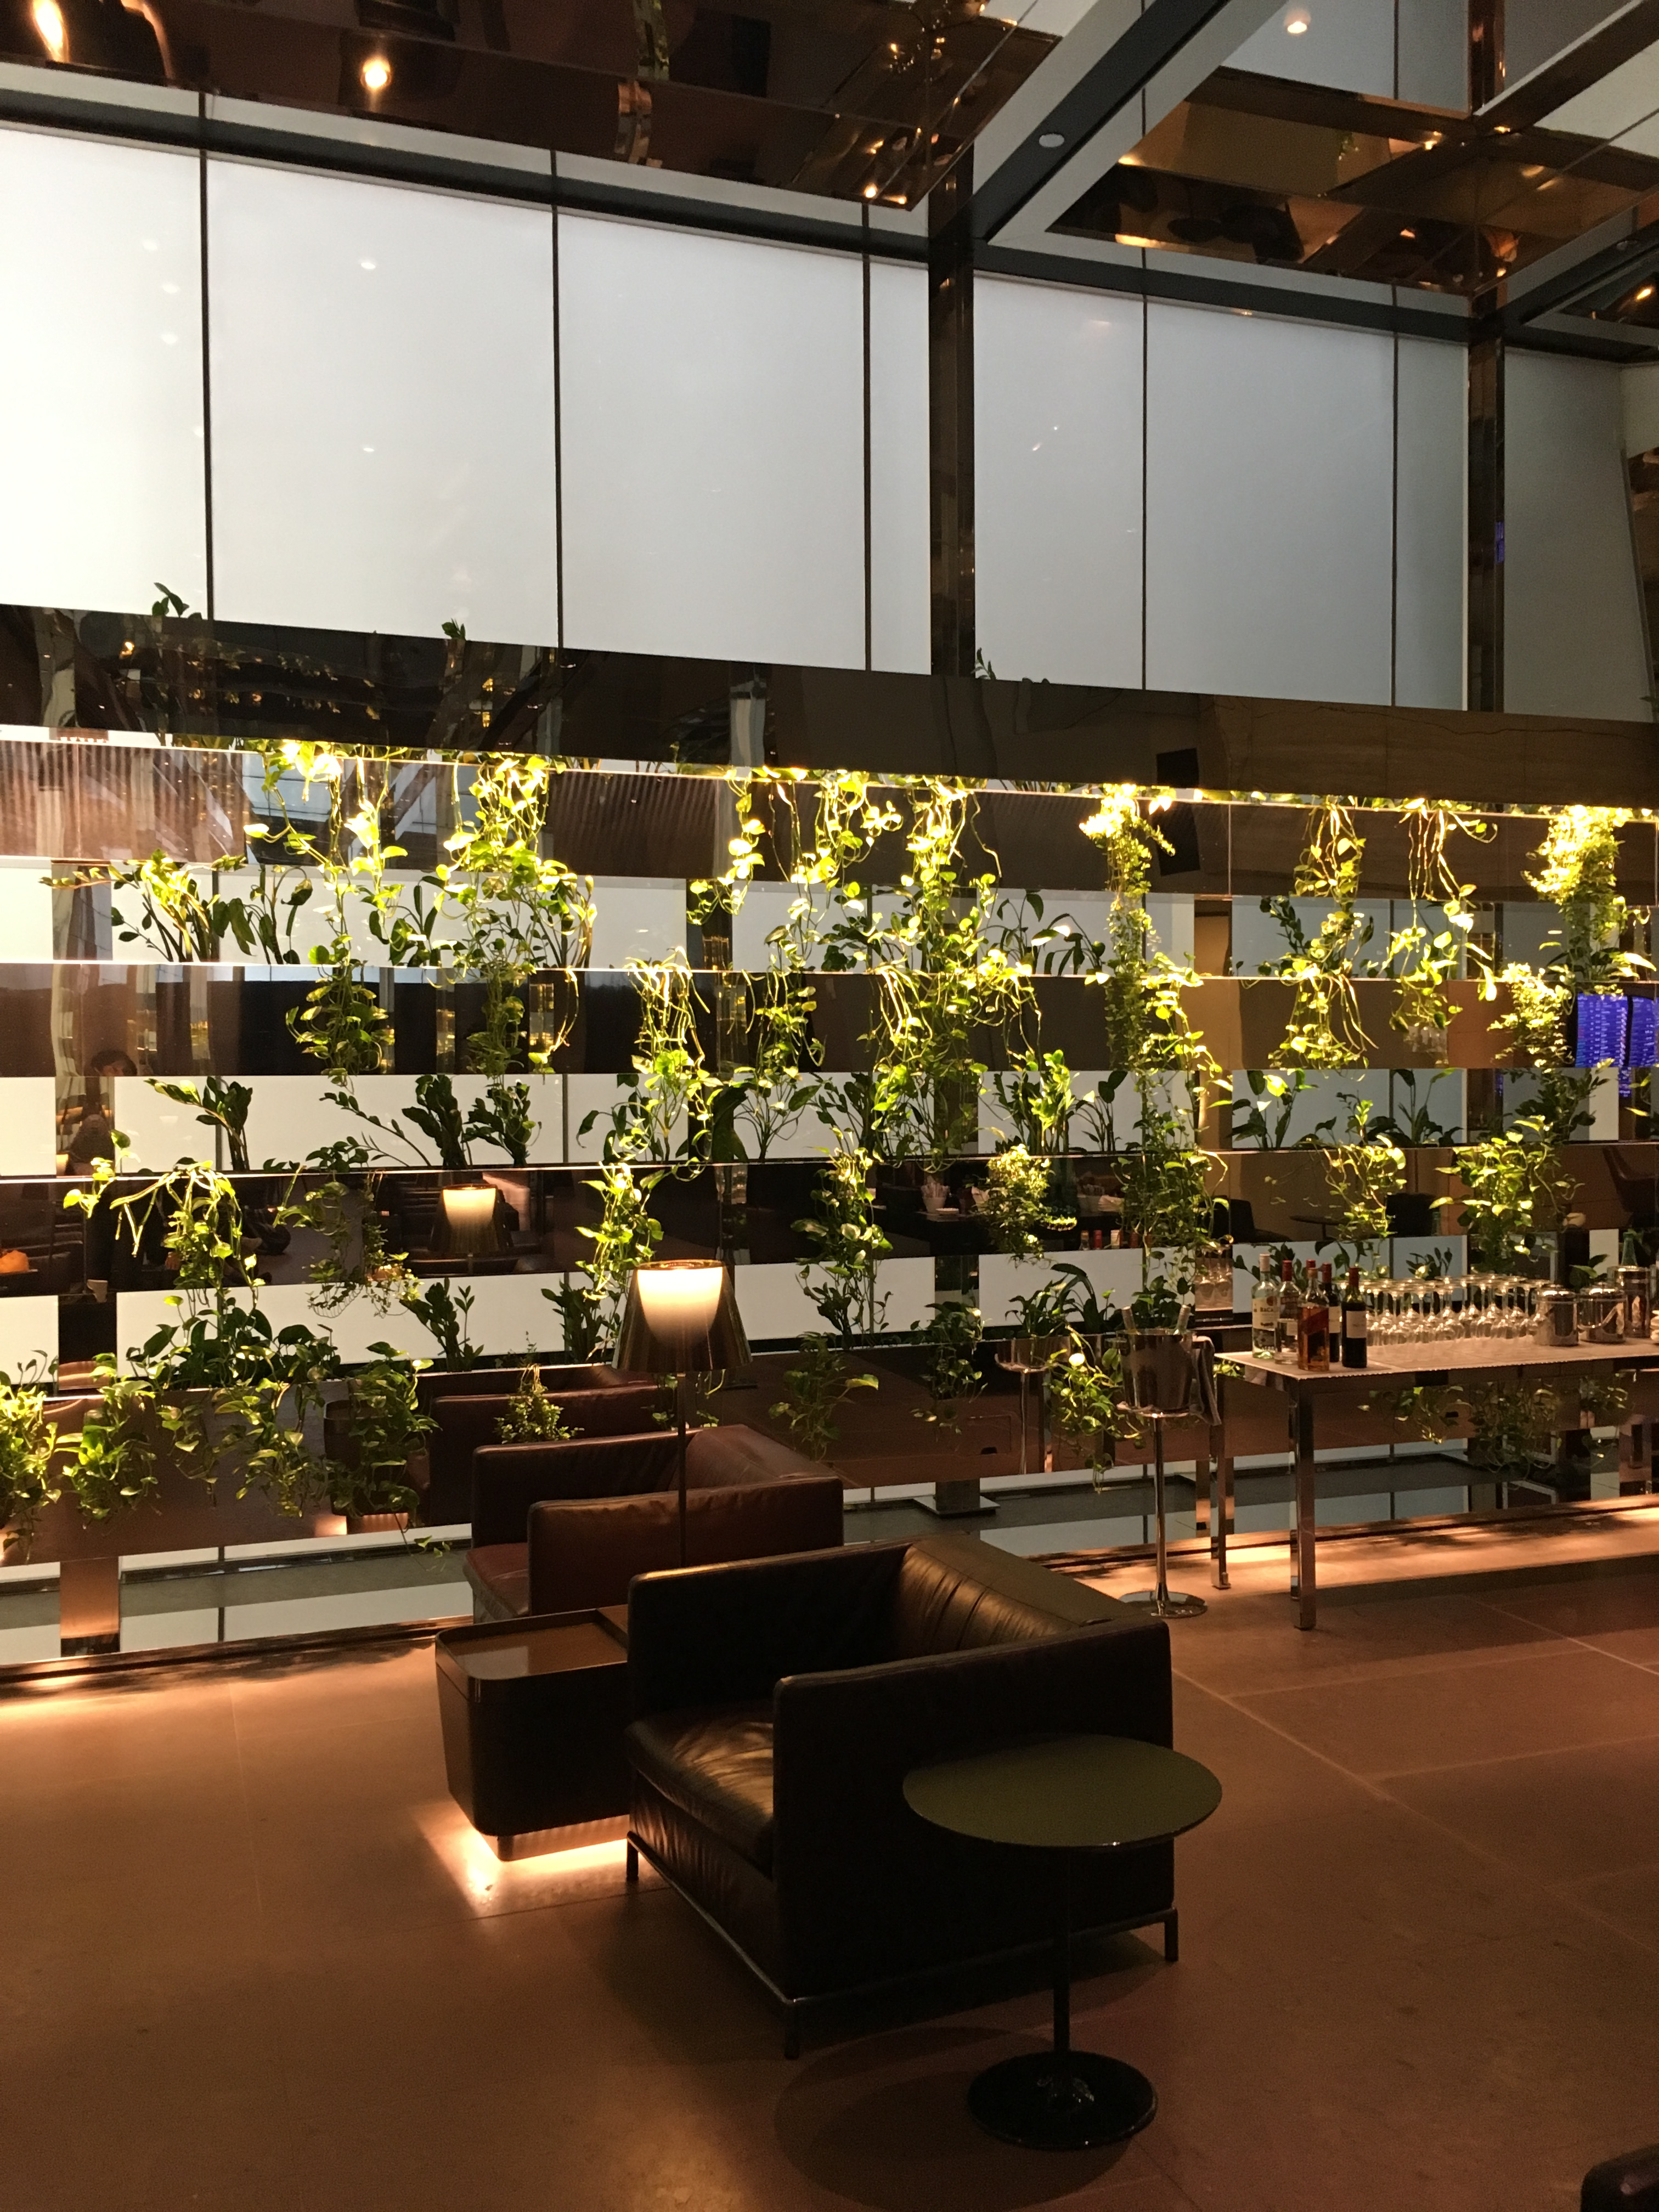 Lounge Review : ドーハ空港(DOH) ファーストクラスラウンジ(ワンワールドメンバー向け)